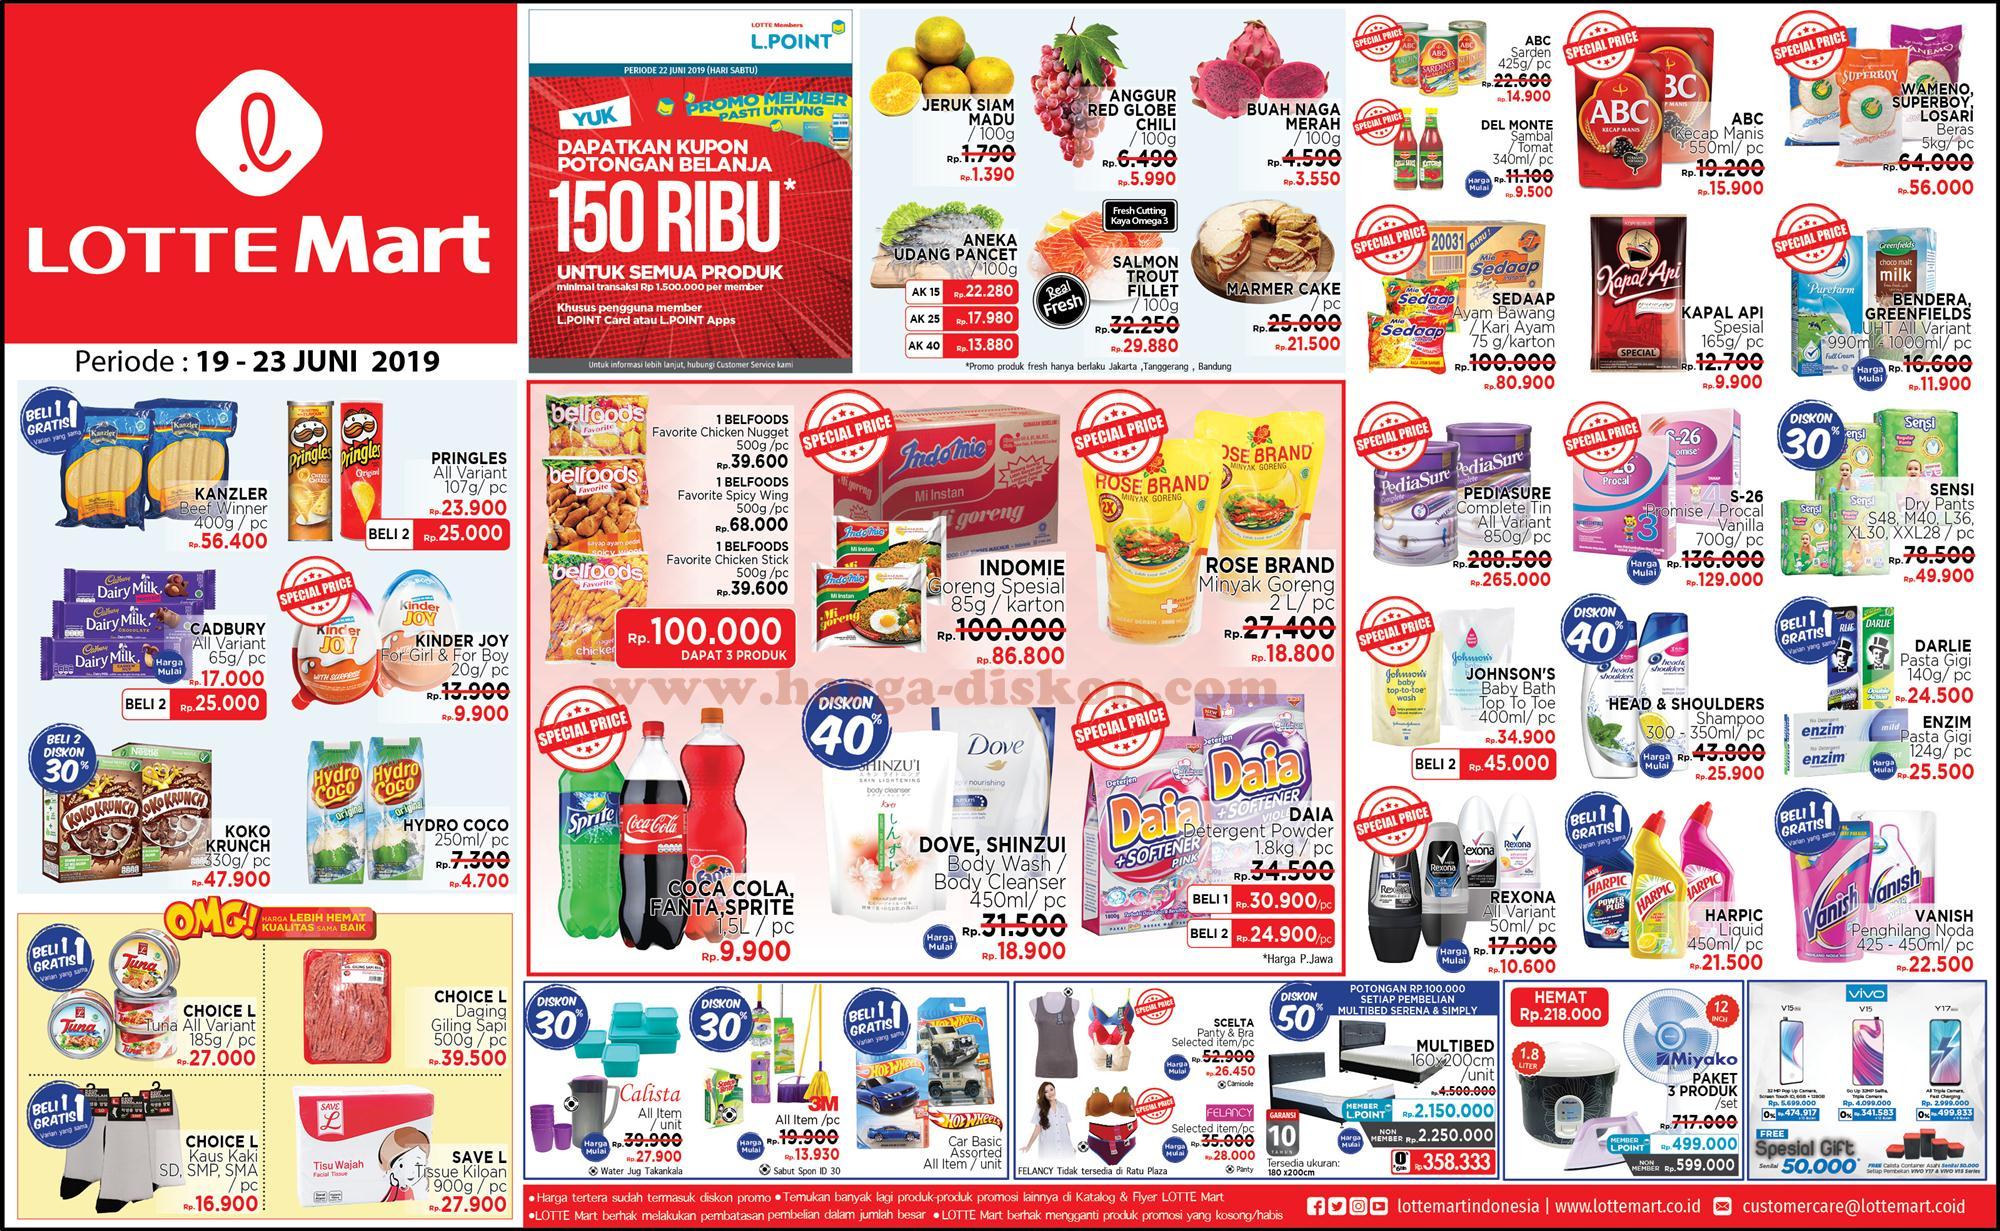 Katalog Promo JSM Lottemart Terbaru Minggu Ini Periode 19 – 23 Juni 2019